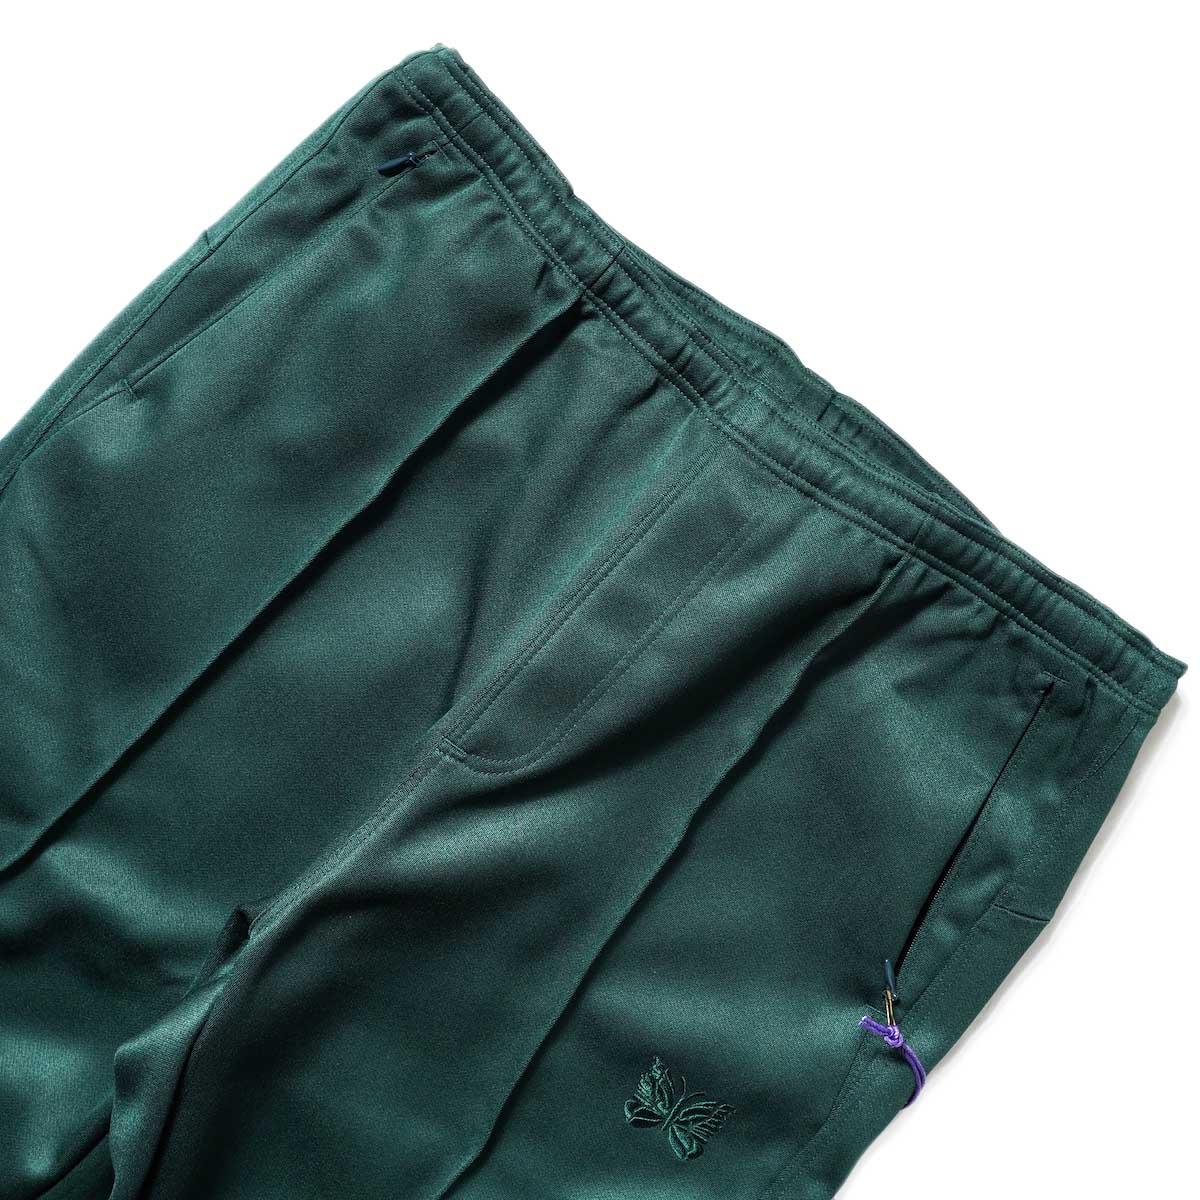 Needles / W.U. BOOT-CUT PANT - PE/R DOESKIN (Green)ウエスト